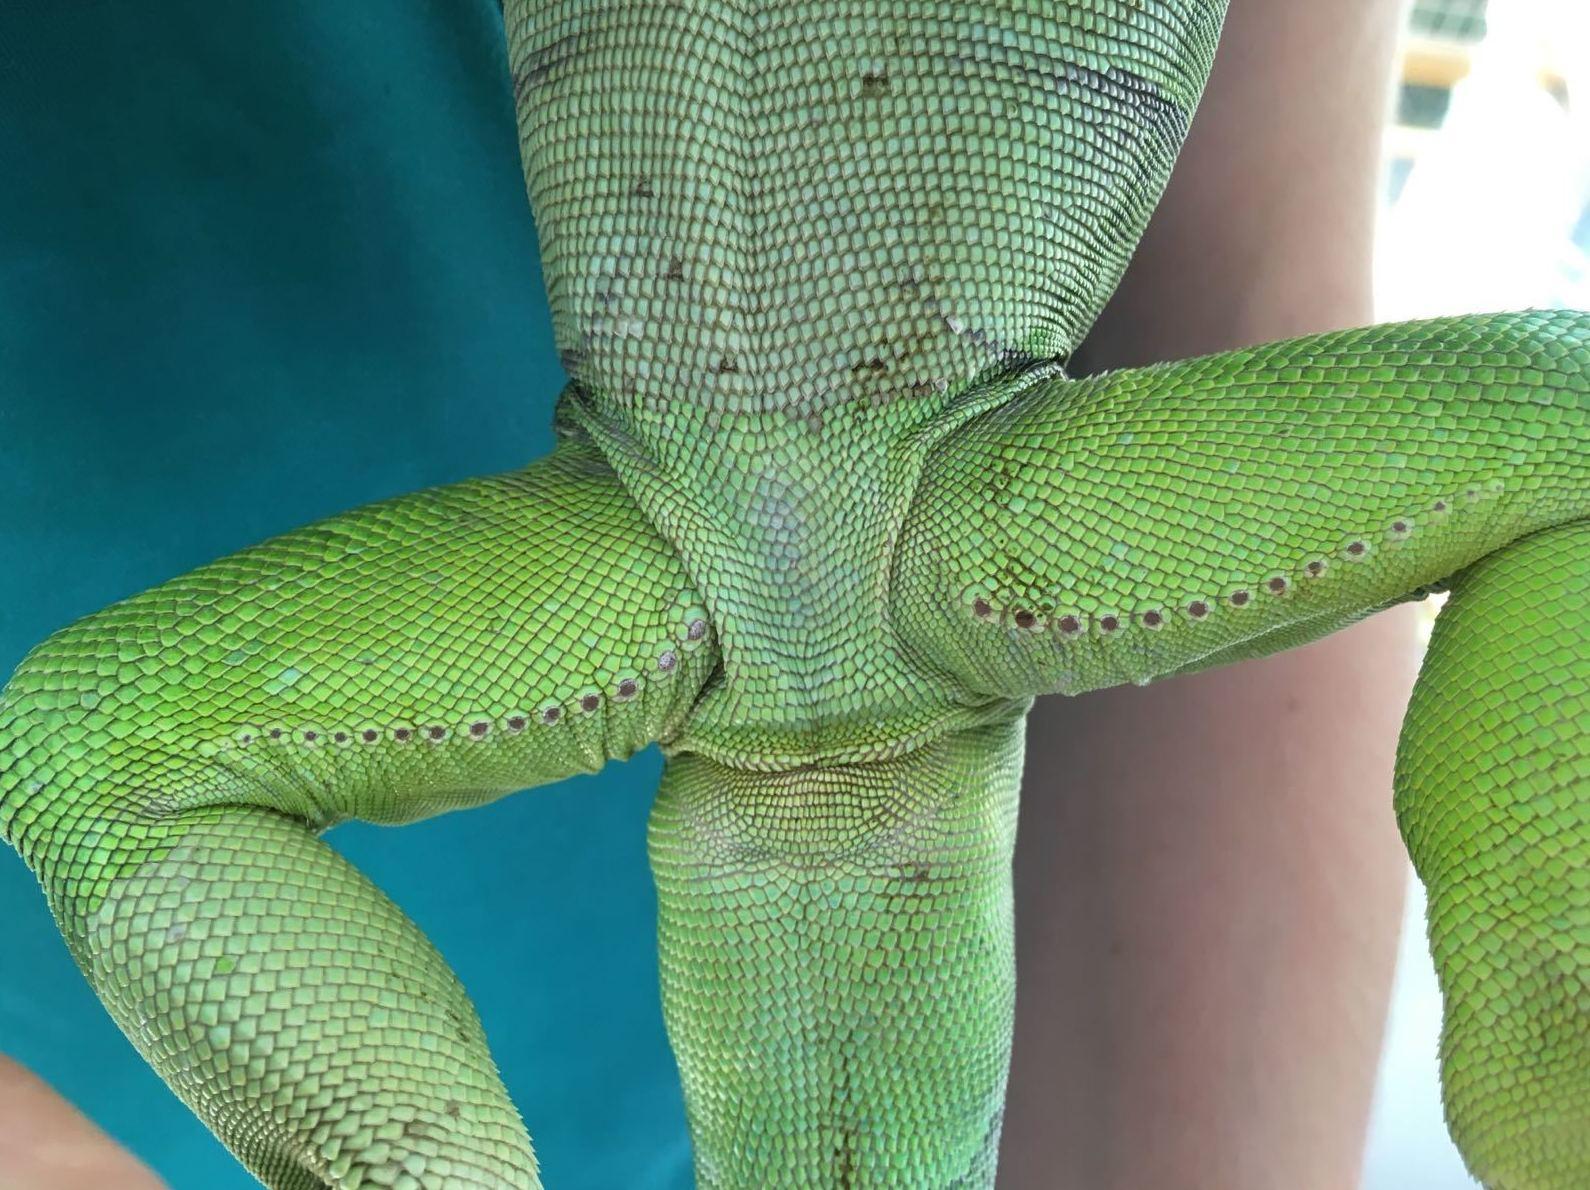 Poros femorales de una Iguana verde macho (Iguana iguana)